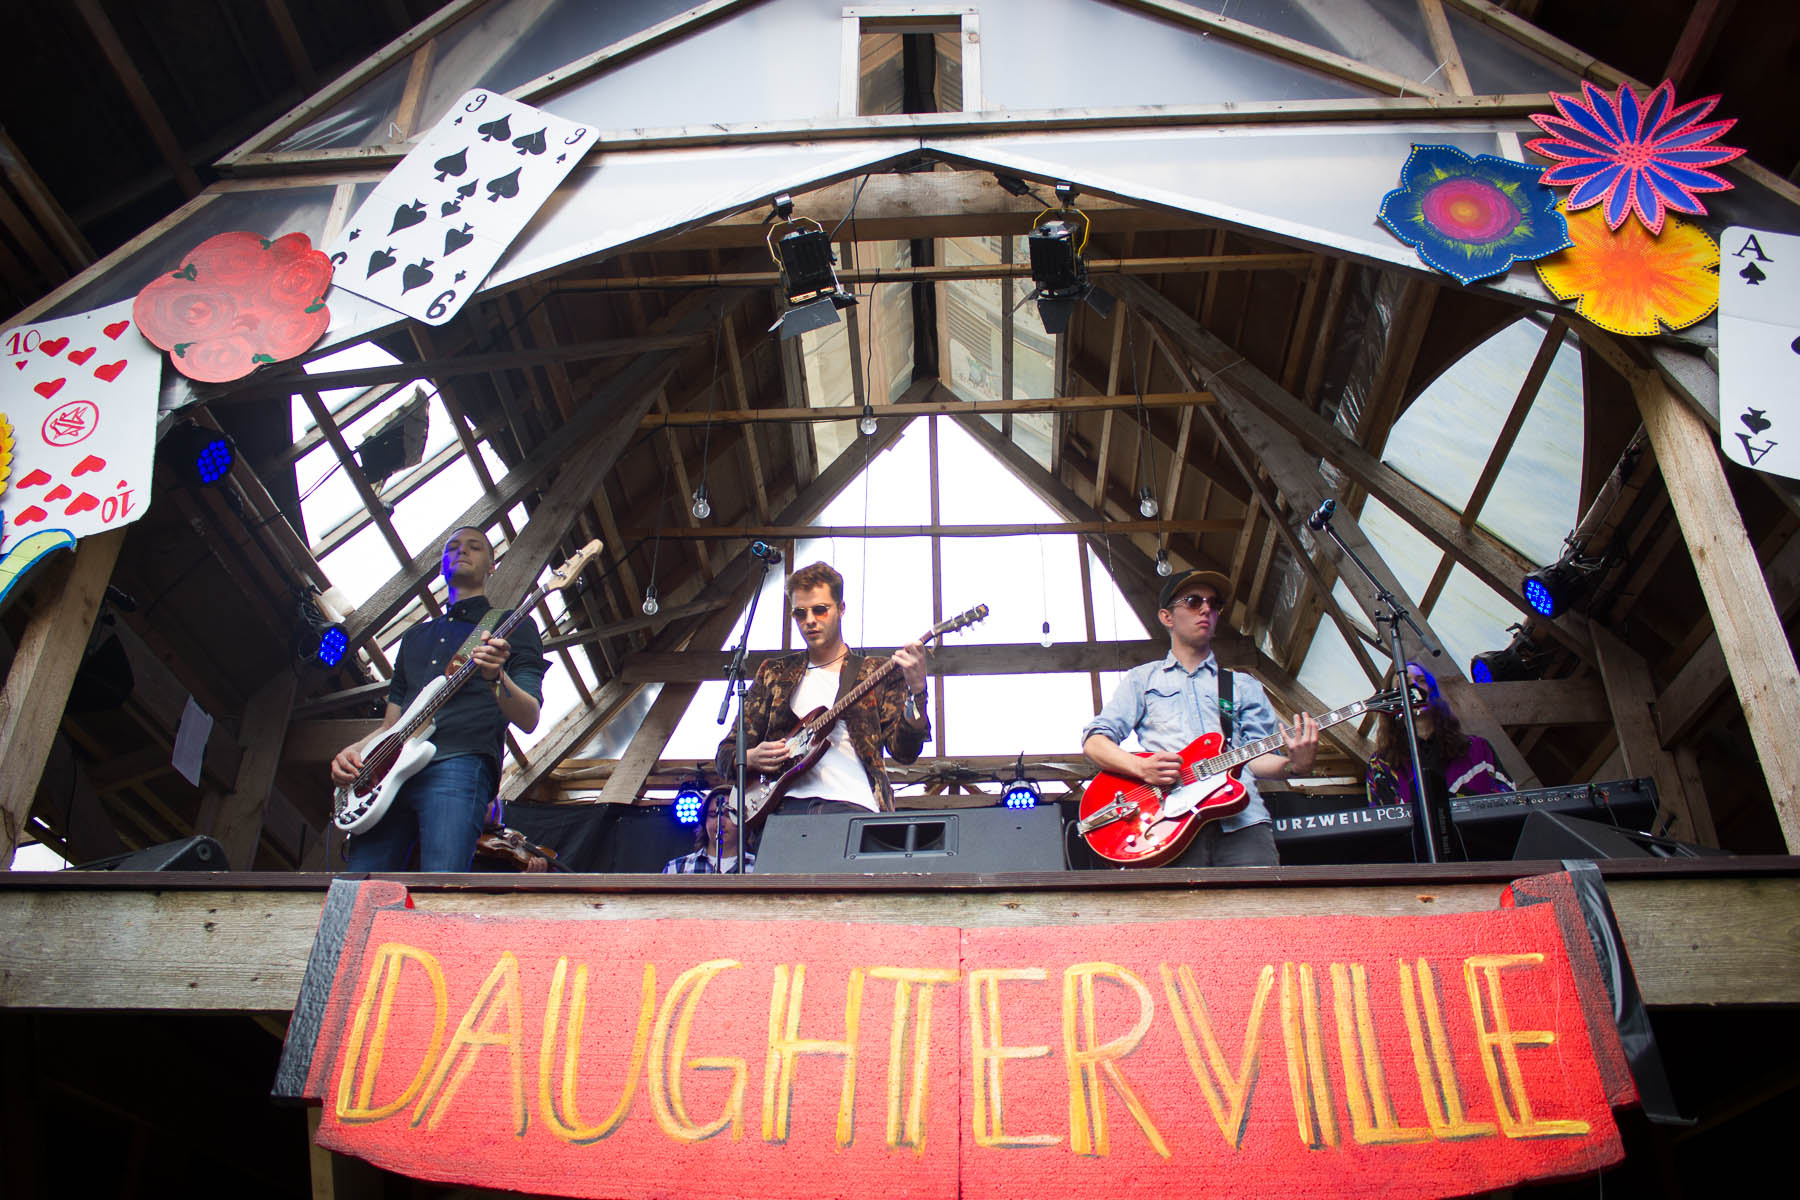 Axel Füllgraf - Daughterville - The Vagabonds